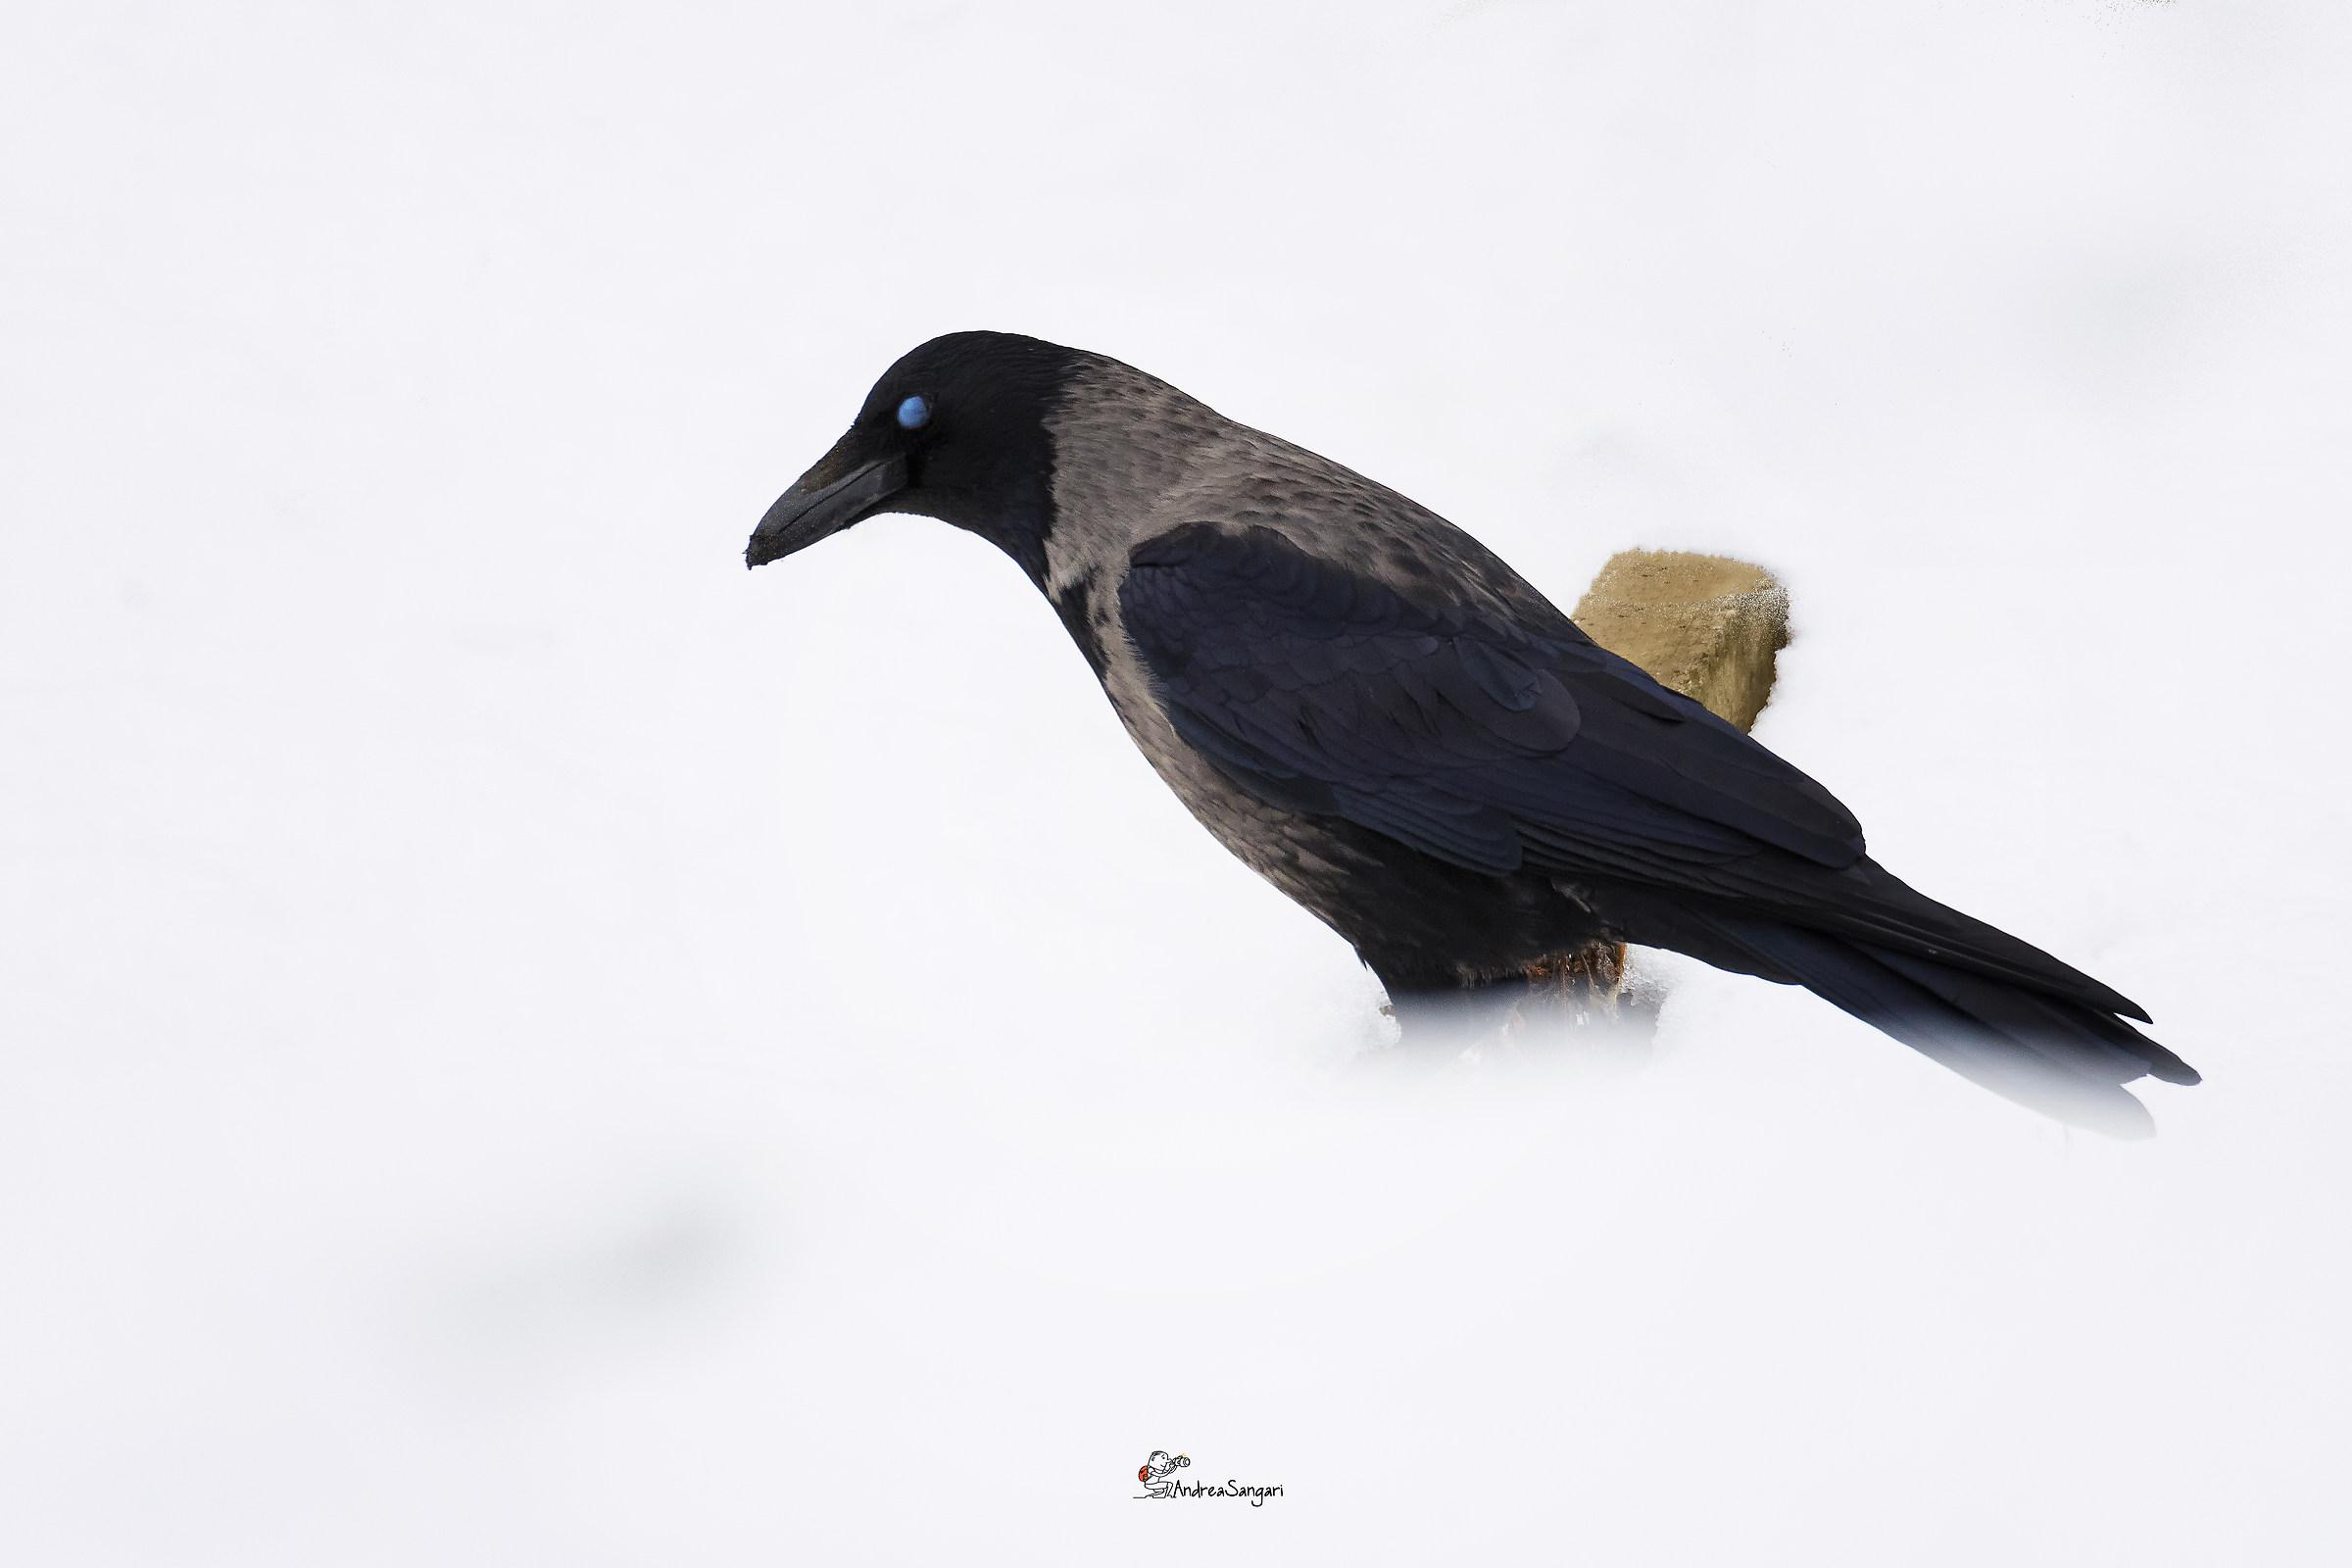 The Snowy Crow...